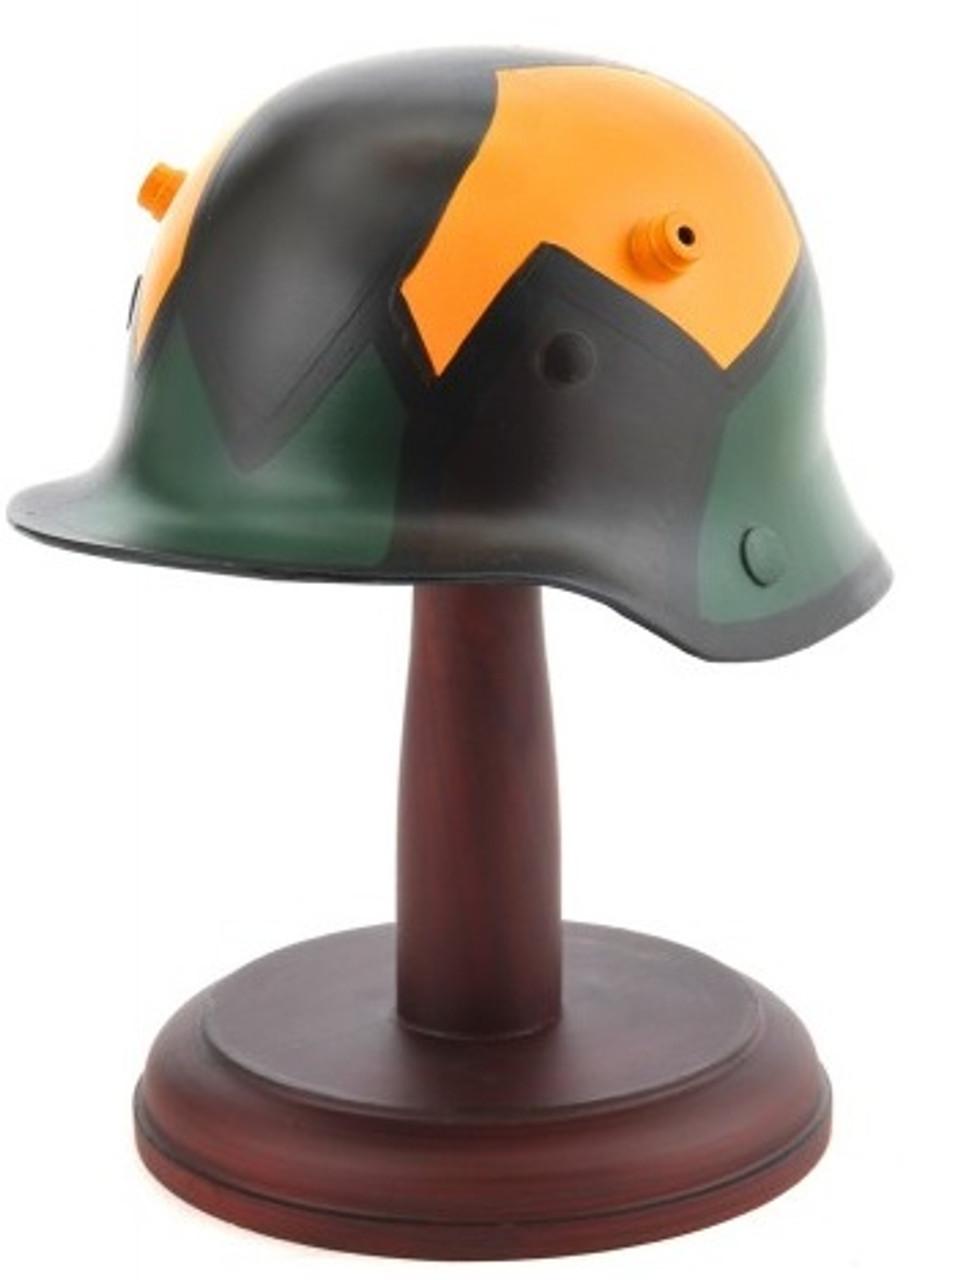 Desktop German WW1 Camouflage M1916 M16 Stahlhelm Helmet with wood stand